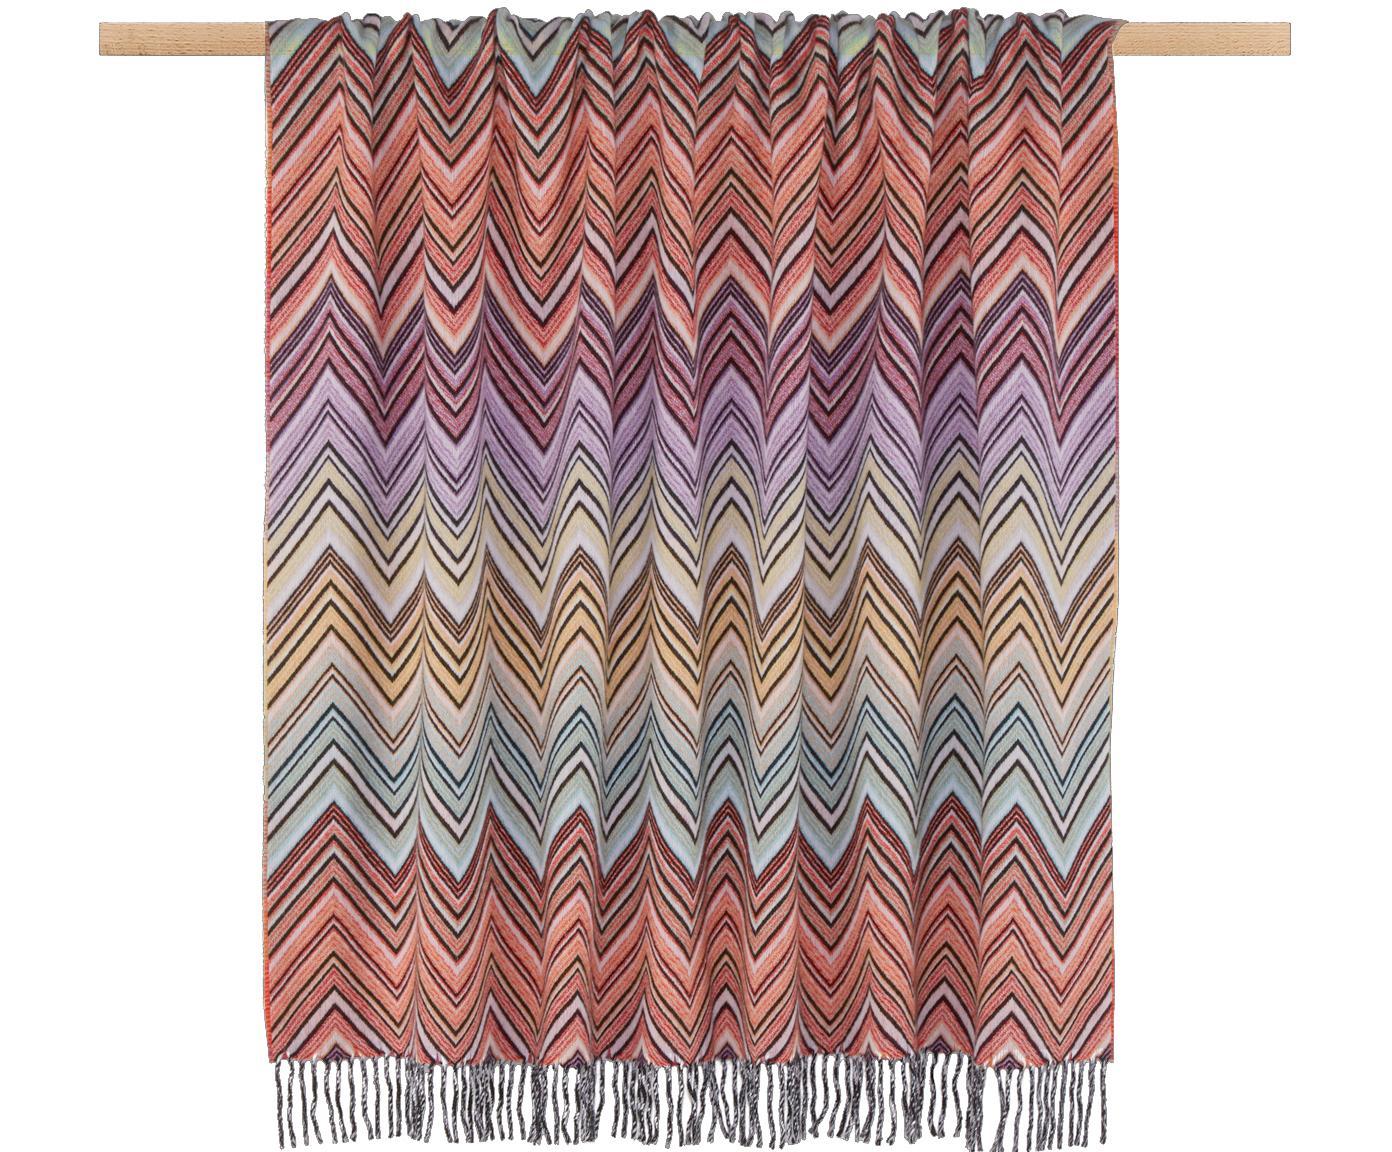 Wollen plaid Perseo, 90% wol, 10% kashmir, Oranje, multicolour, 130 x 190 cm